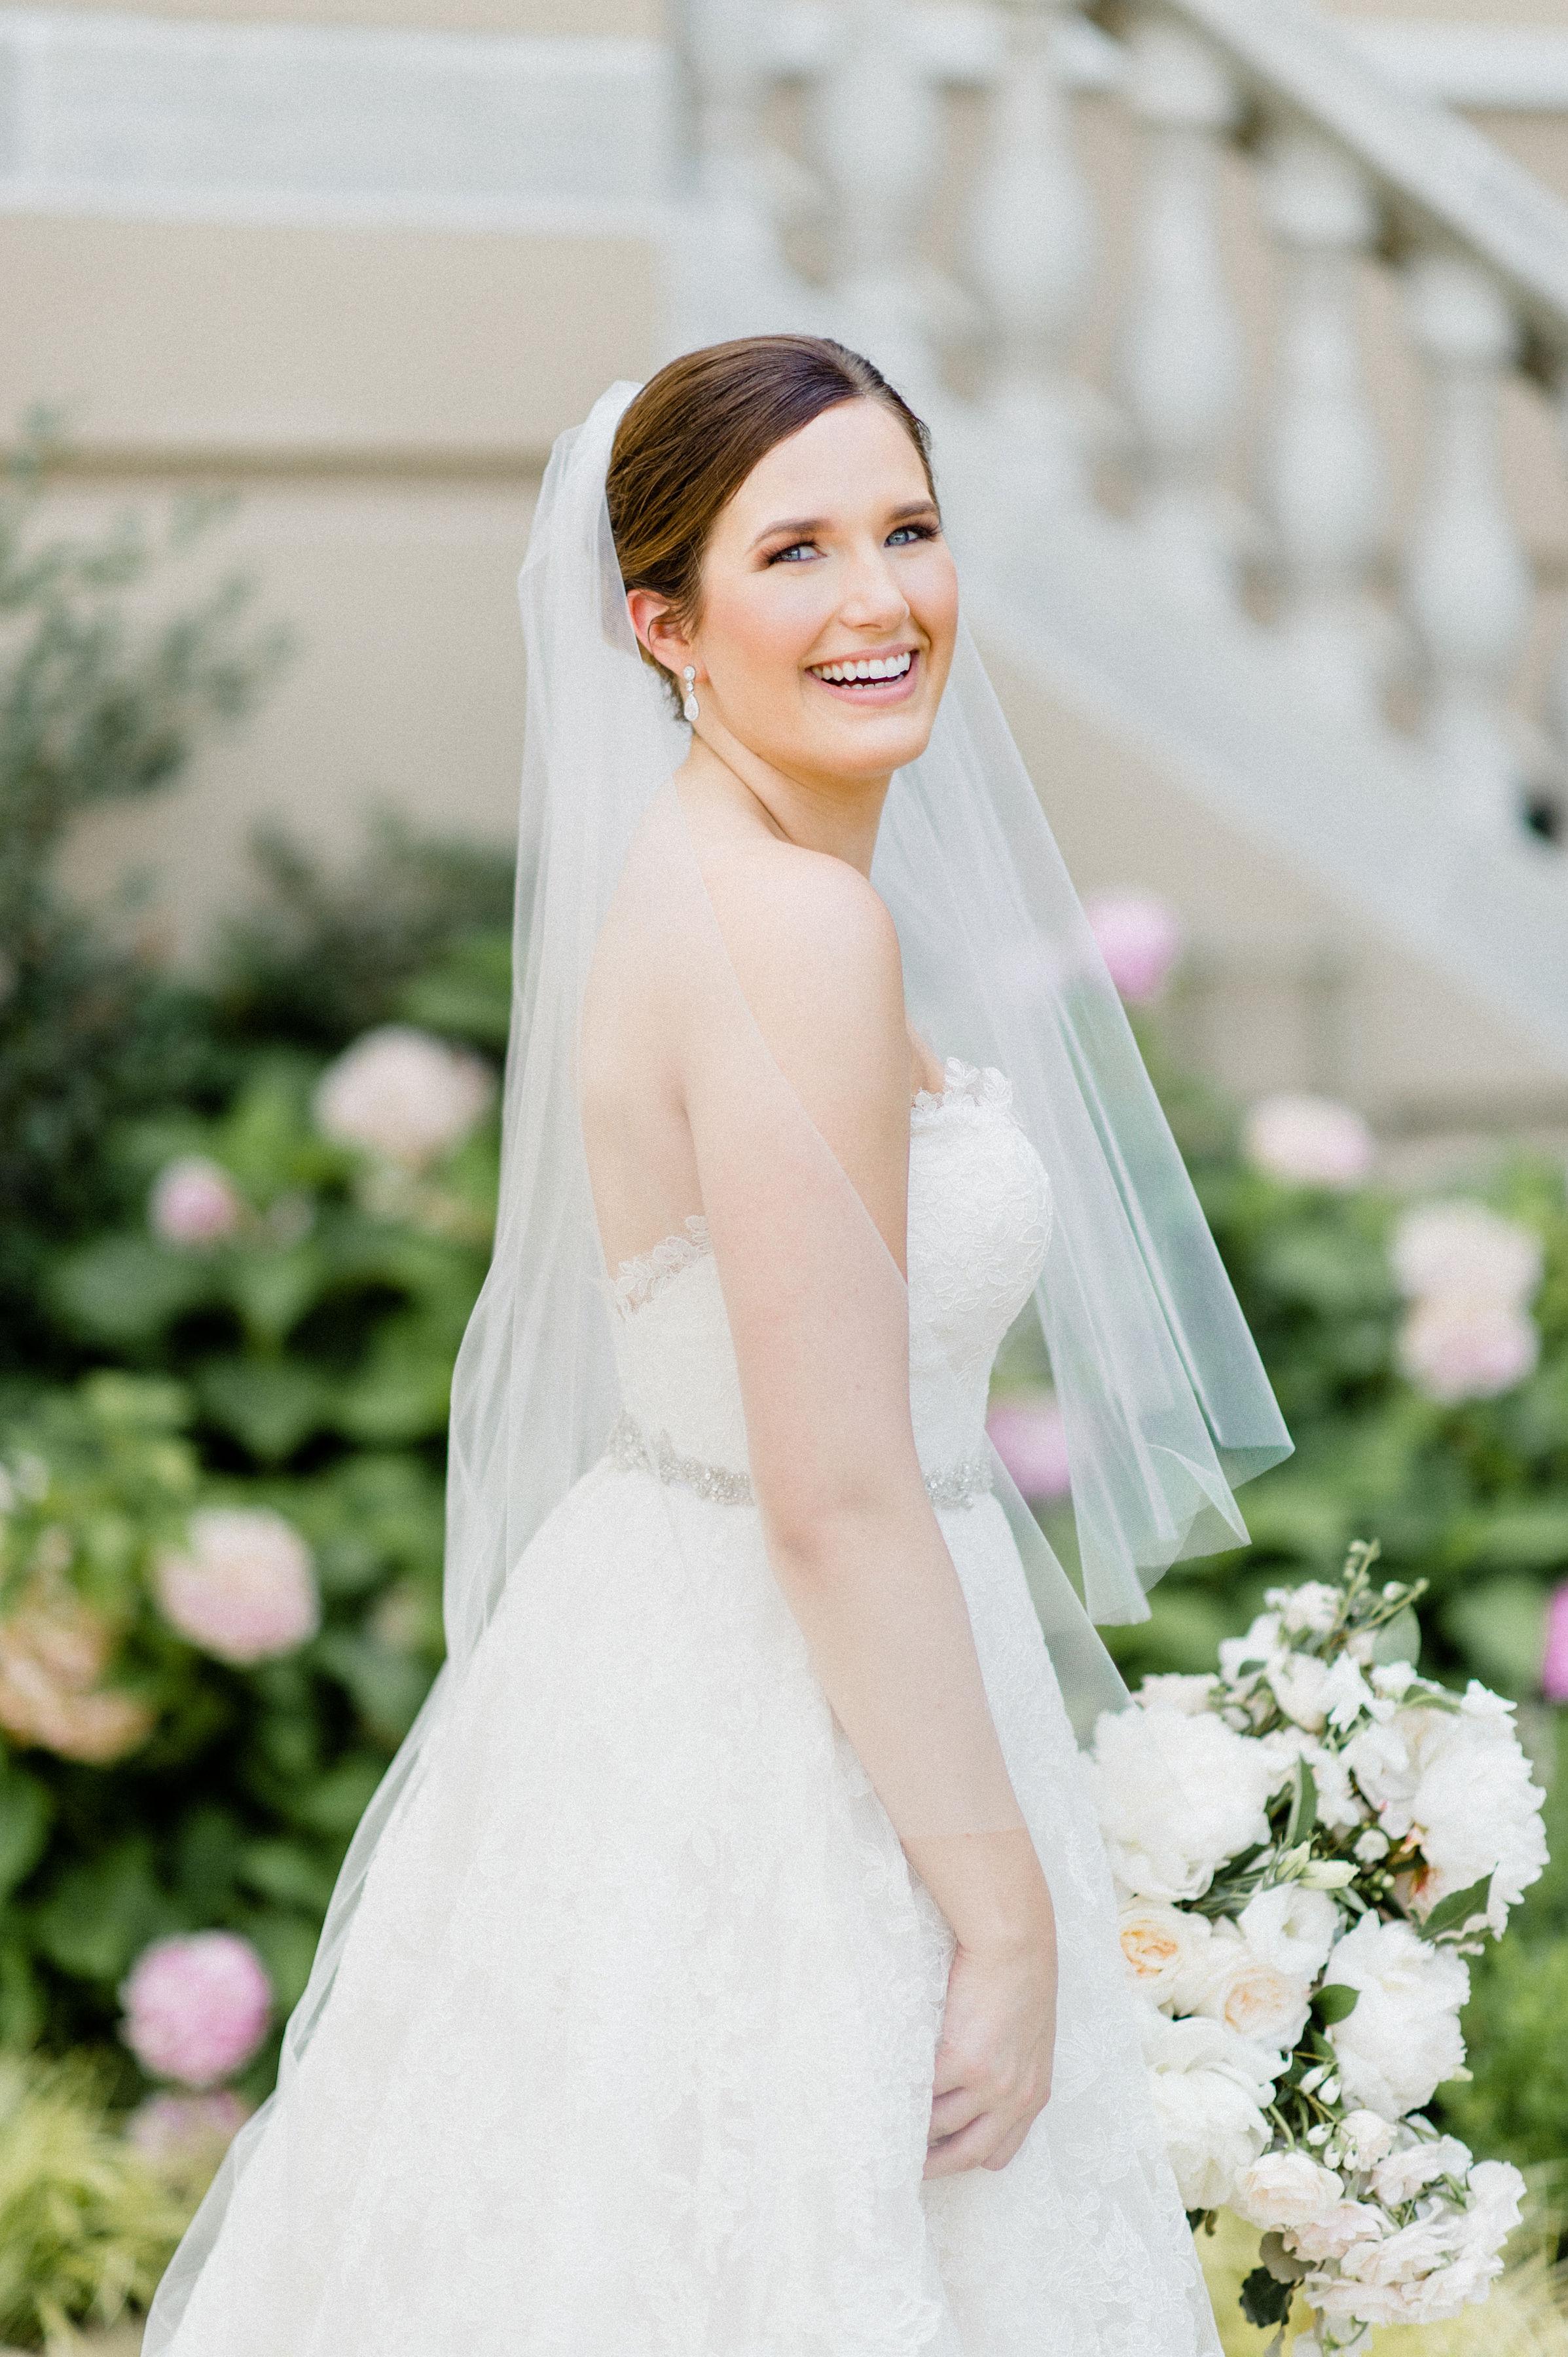 McElravey_Wedding_CarolineLimaPhotography_2018_223.jpg